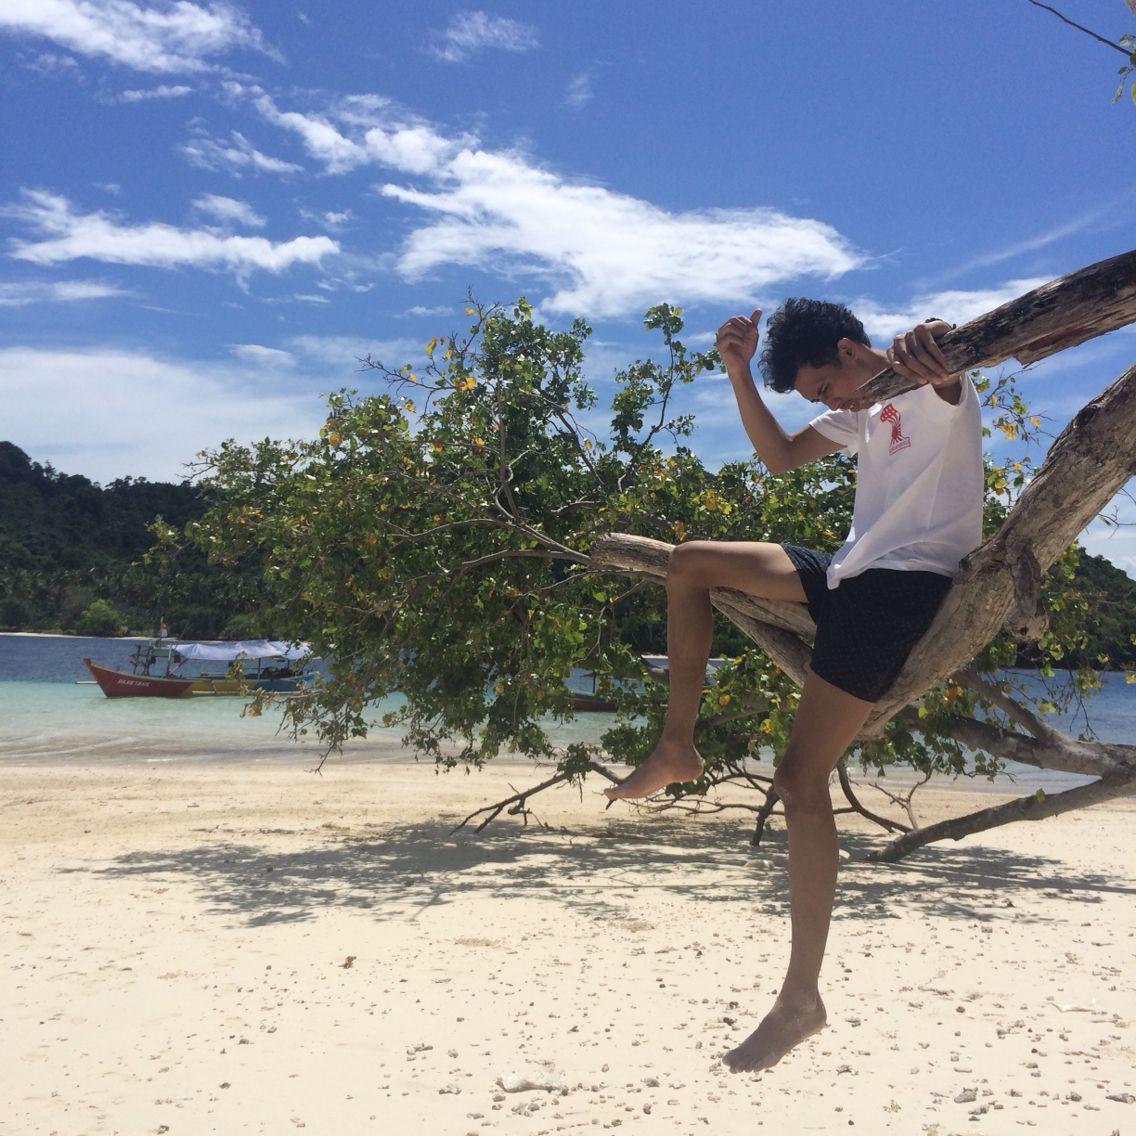 Sun, beach, sand  #travelling #beach #summer #exploreindonesia #explorelampung #pahawangisland #photograph #photography